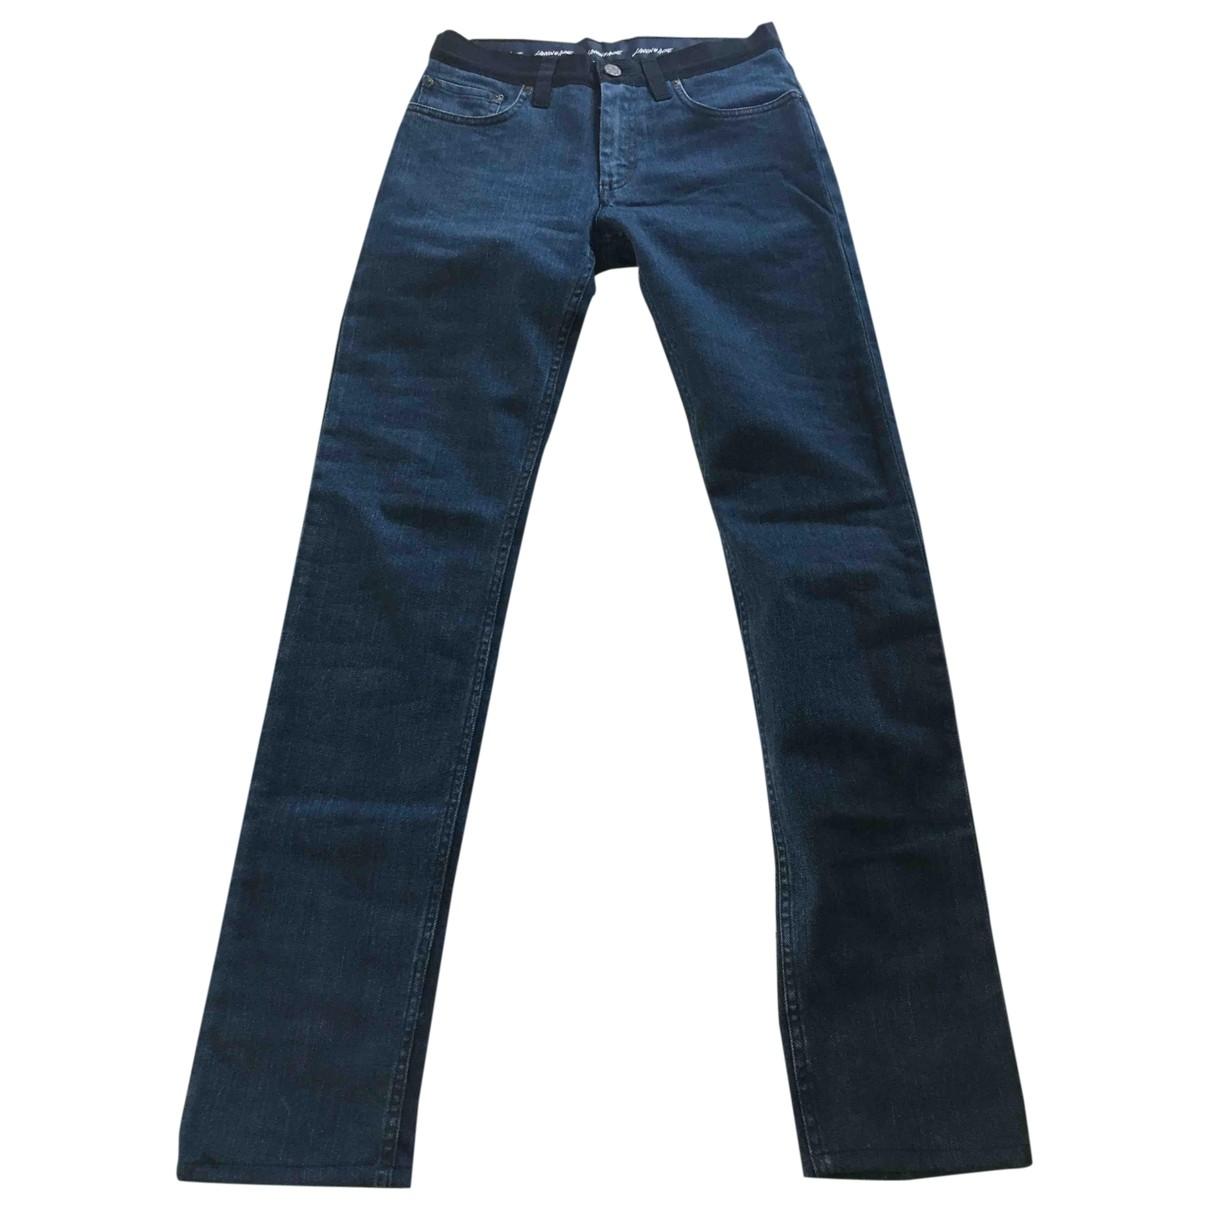 Lanvin - Jean   pour femme en coton - elasthane - bleu